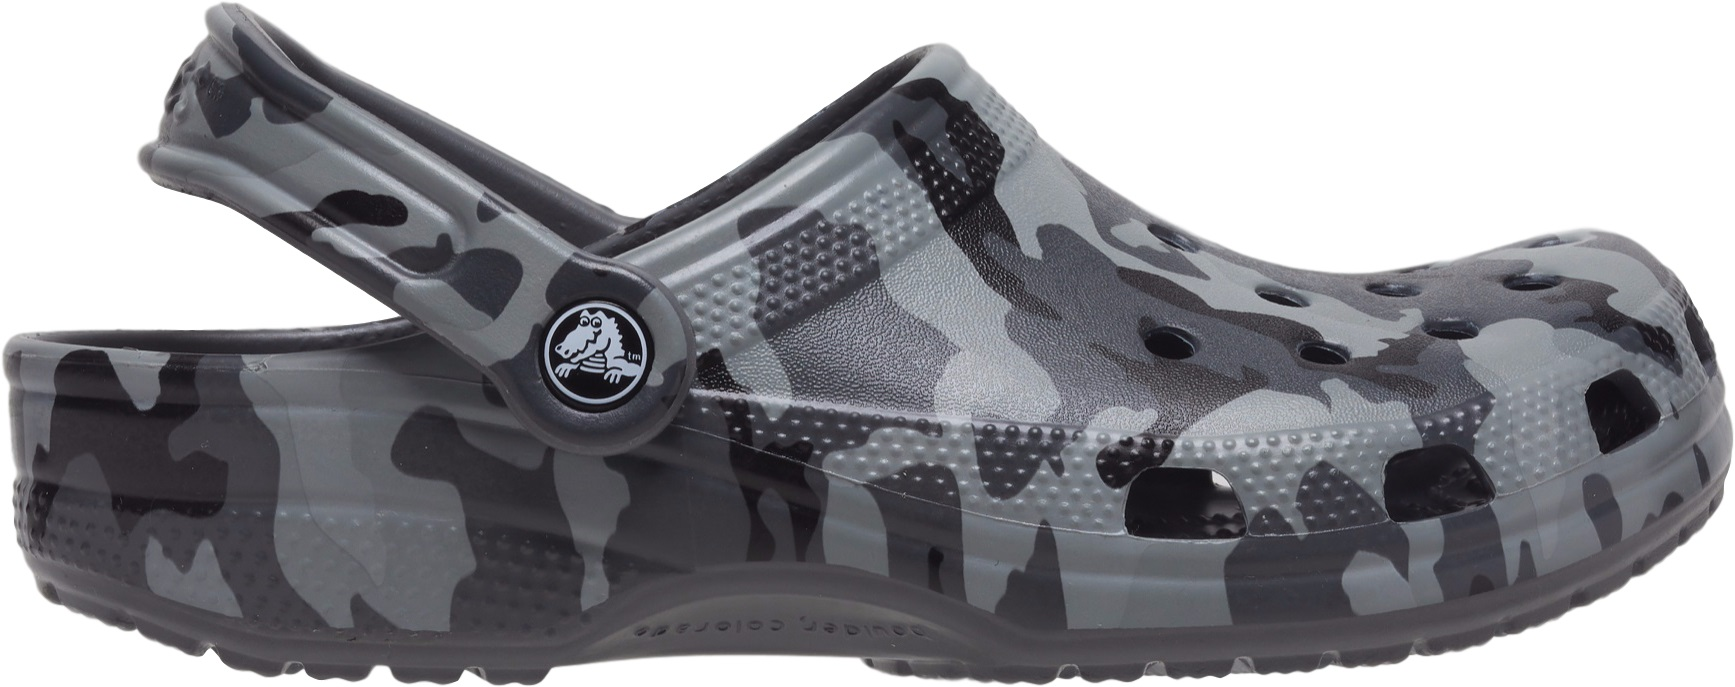 Crocs™ Classic Printed Camo Clog Slate Grey/Multi 36,5